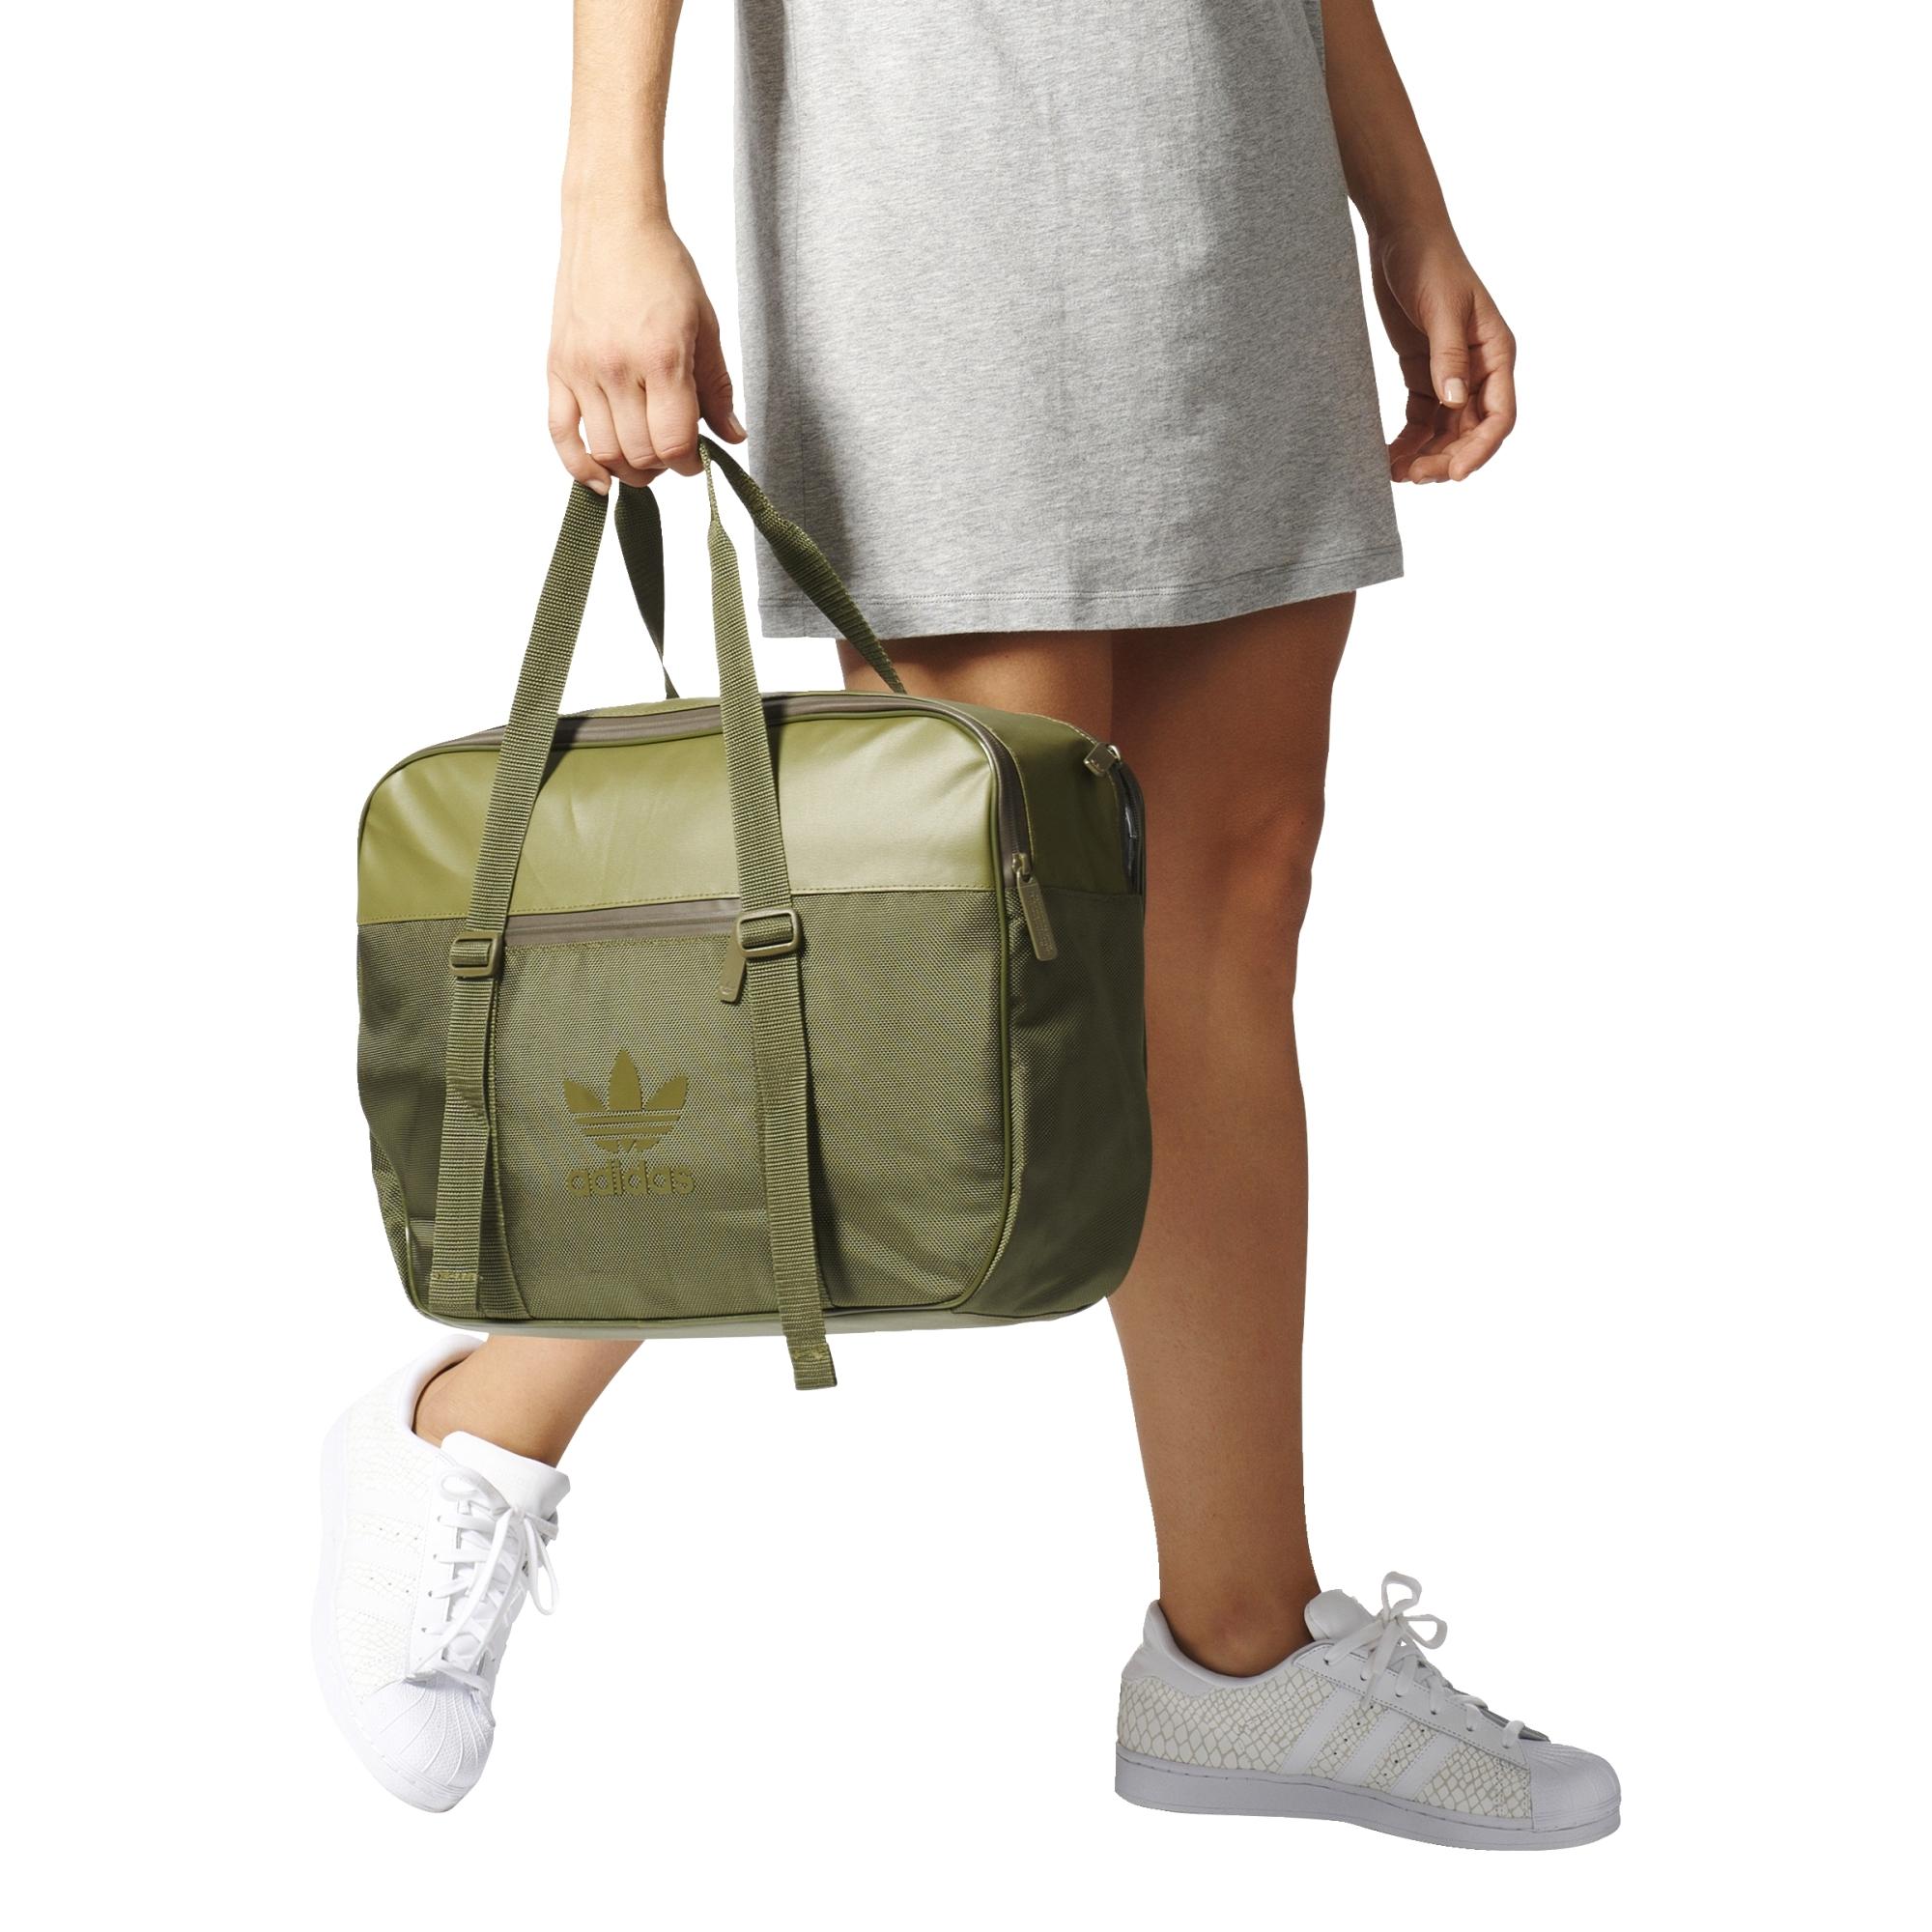 7a7e623084052 ... torba adidas Airliner Sport Bag BK6739